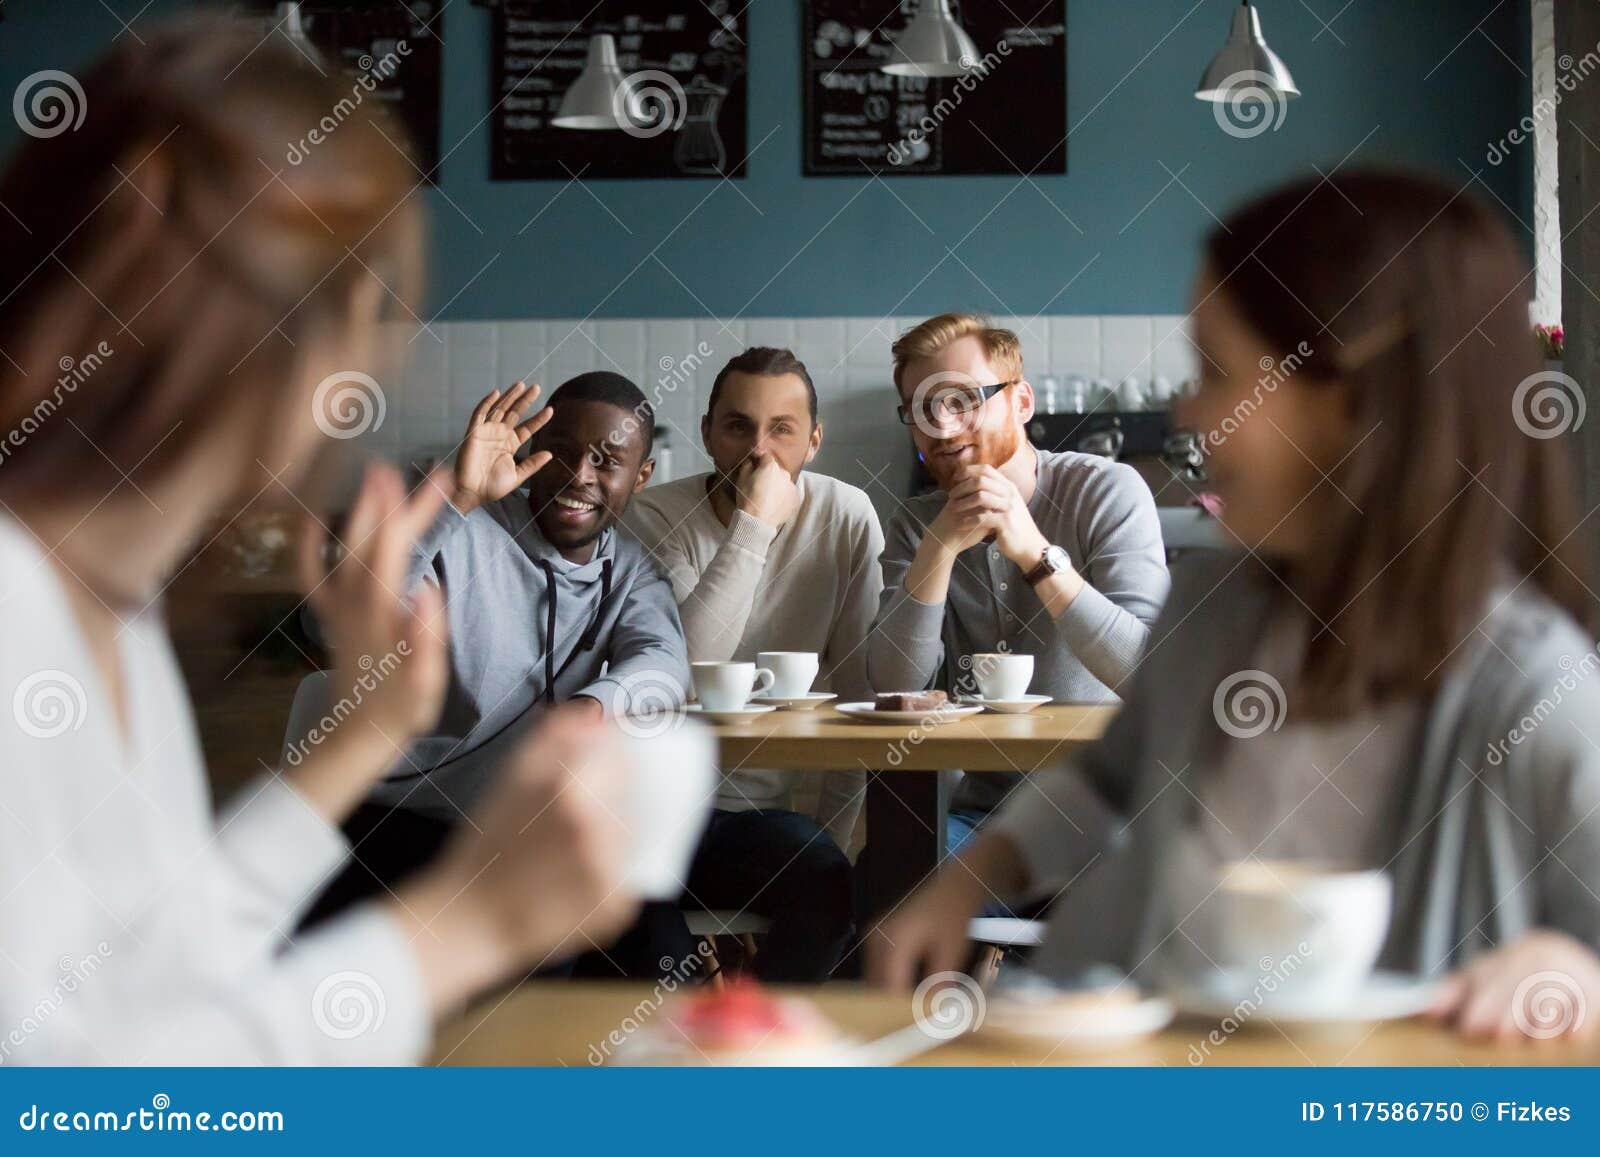 African smiling man waving hand greeting girls meeting in cafe